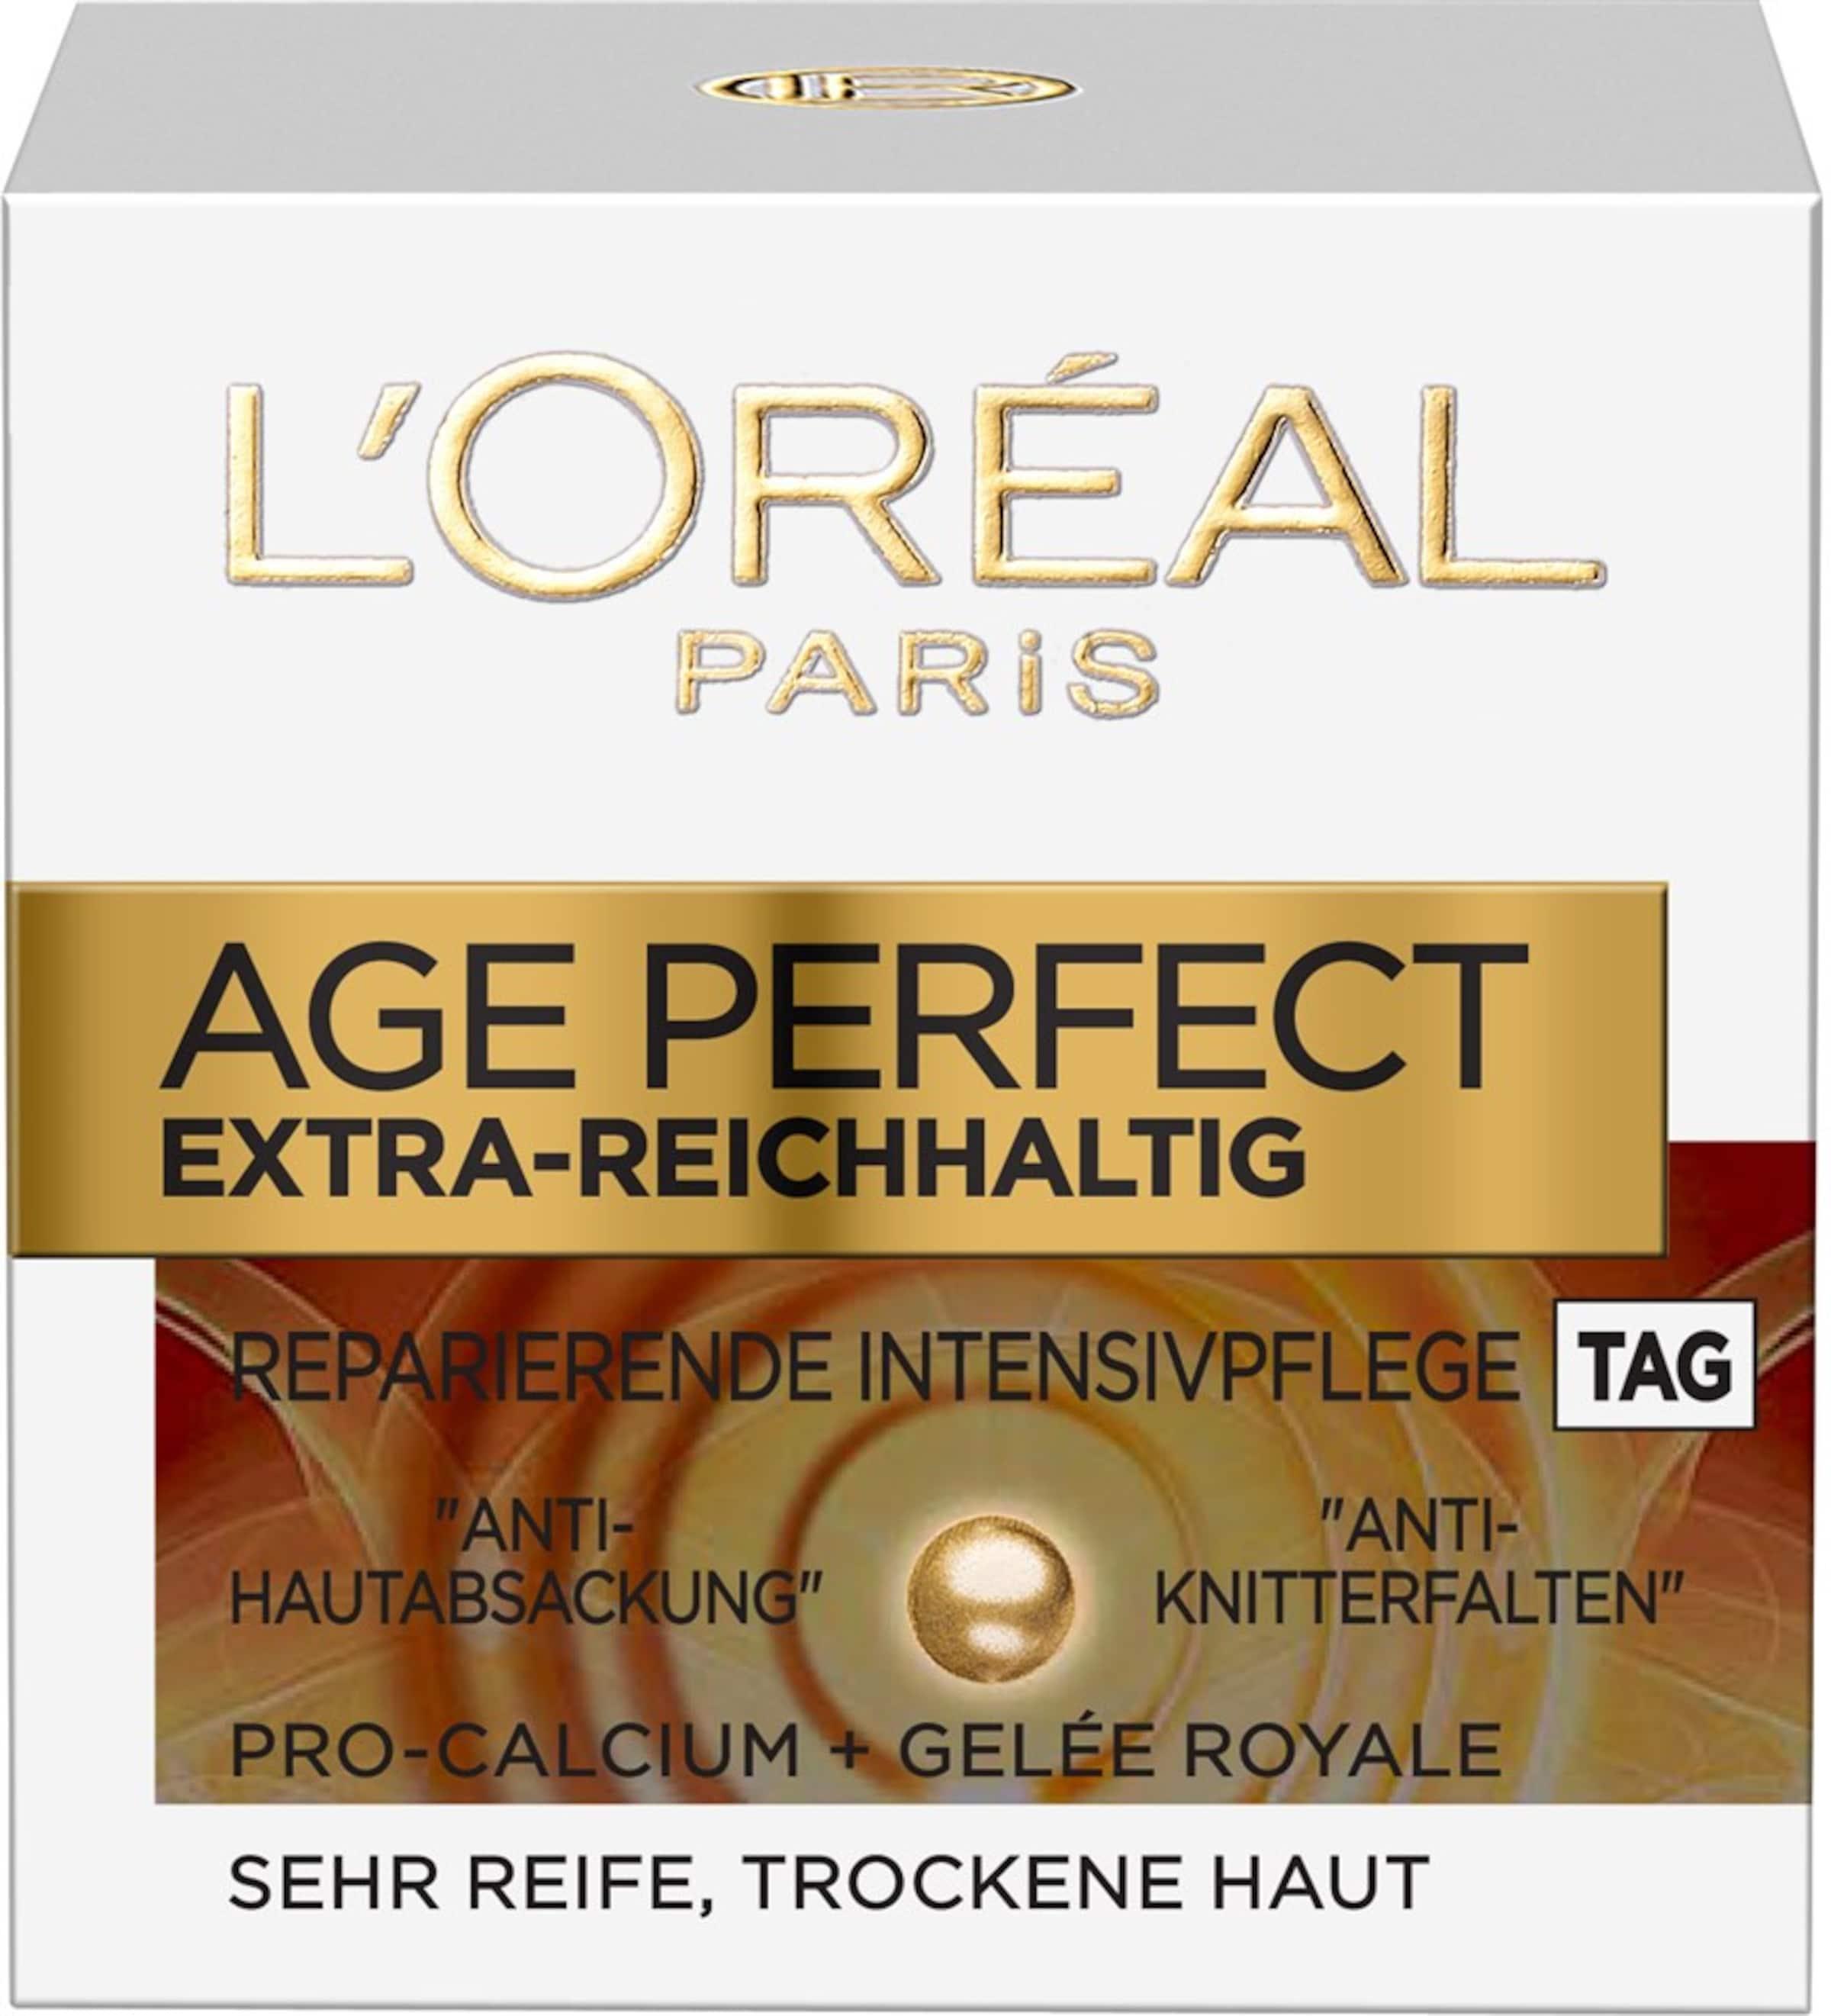 L'Oréal Paris 'Age Perfect Extra-Reichhaltig' Tagespflege Auslass Original JGMPAuzo